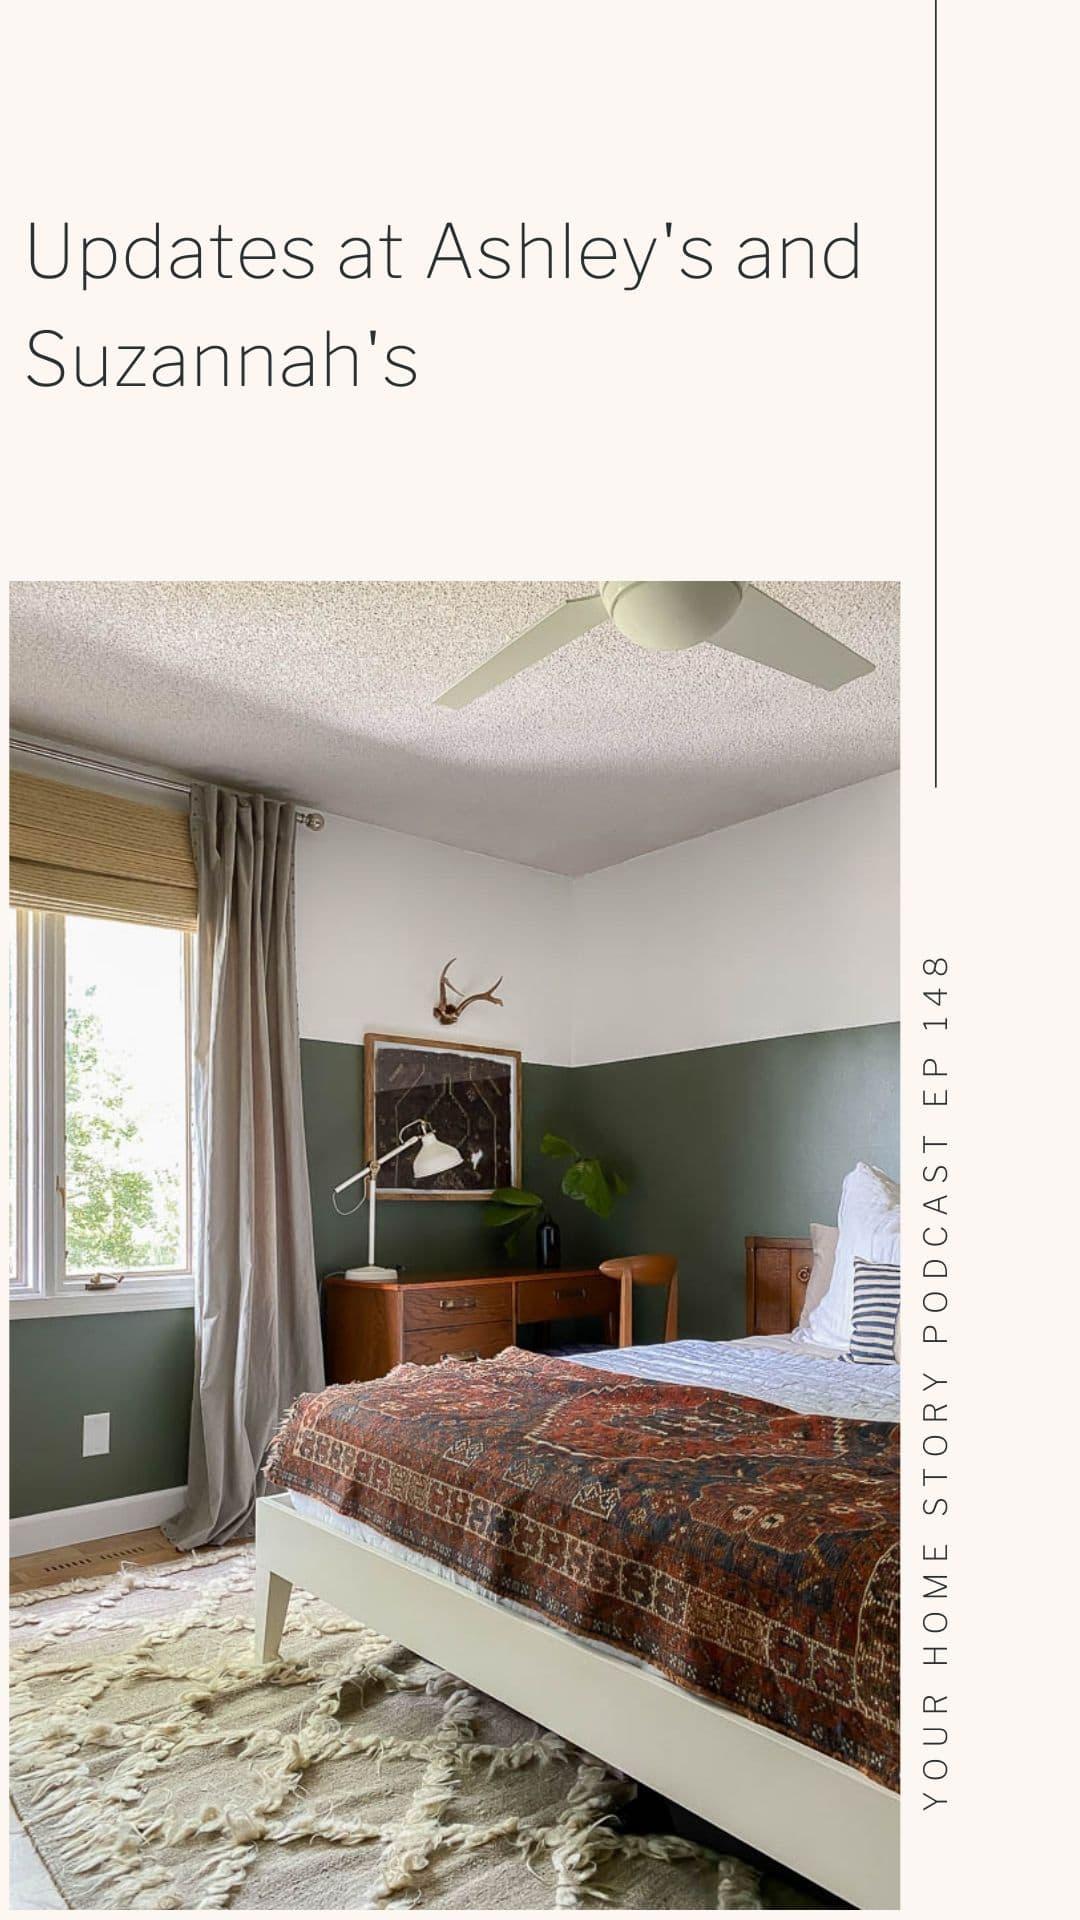 DIY Updates featuring a rug as art